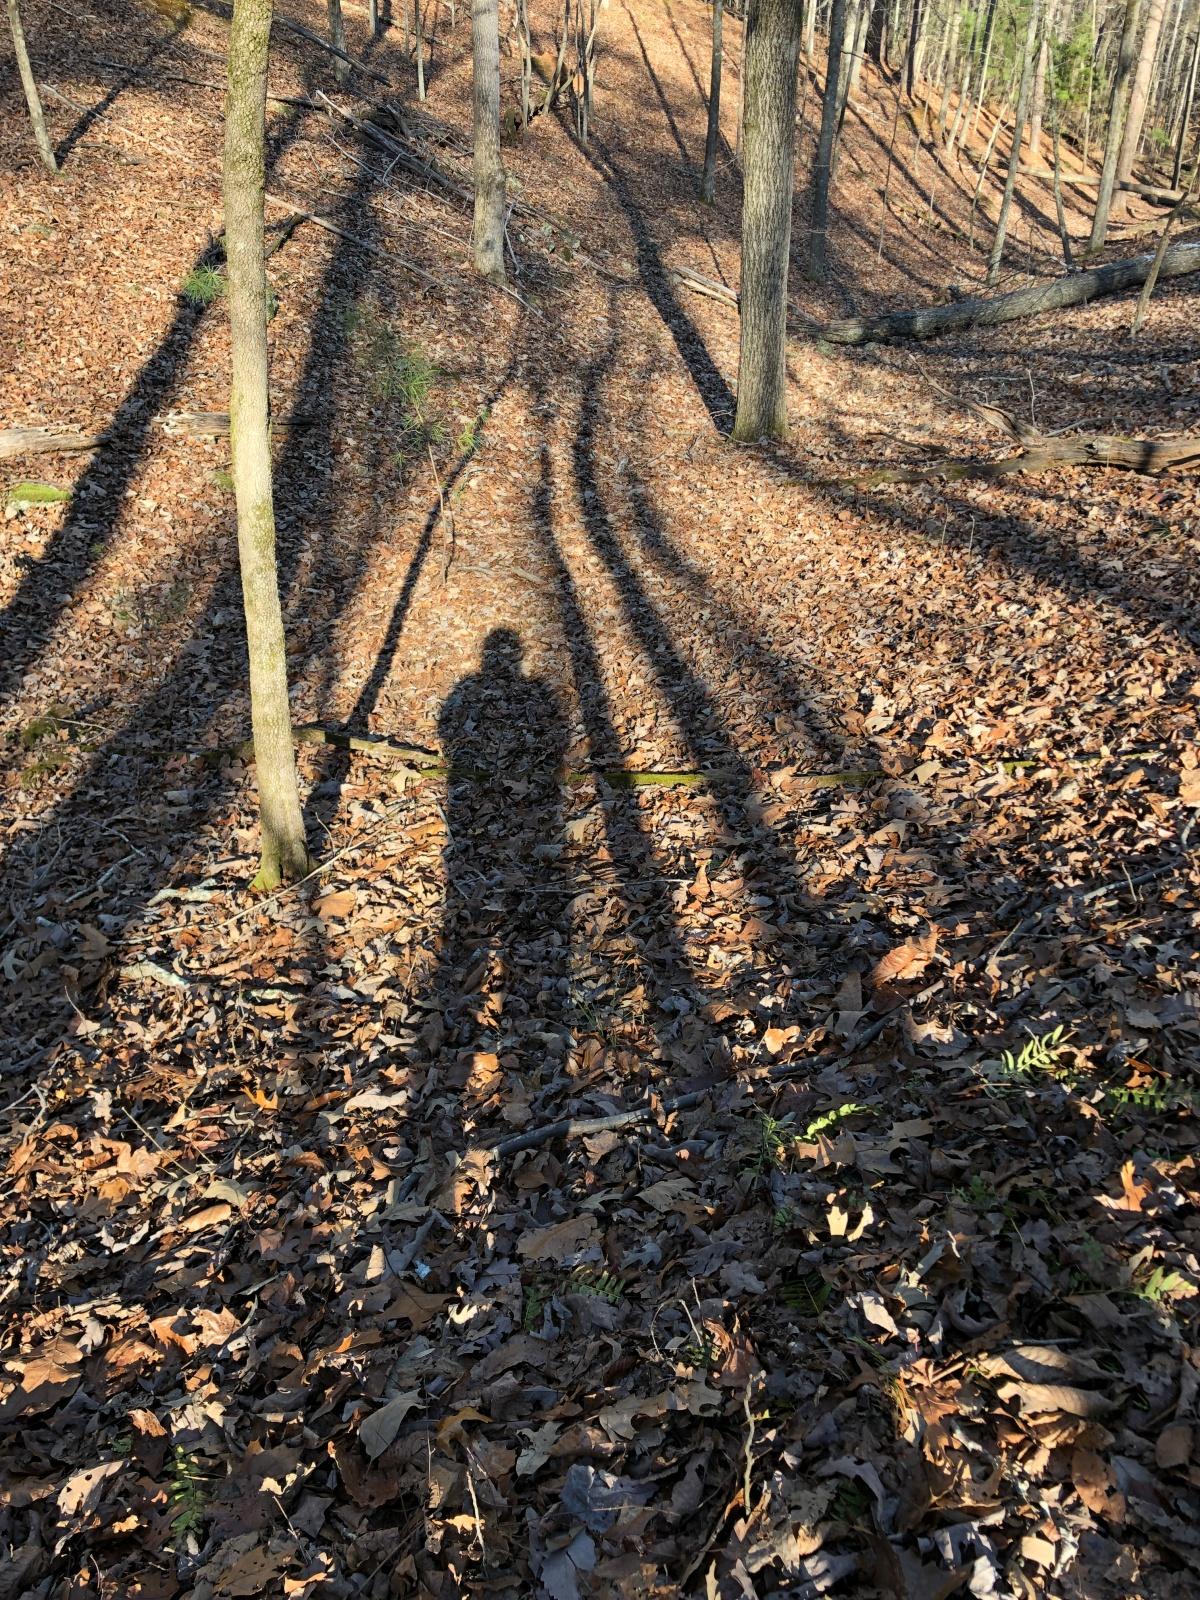 My shadow hiking partner